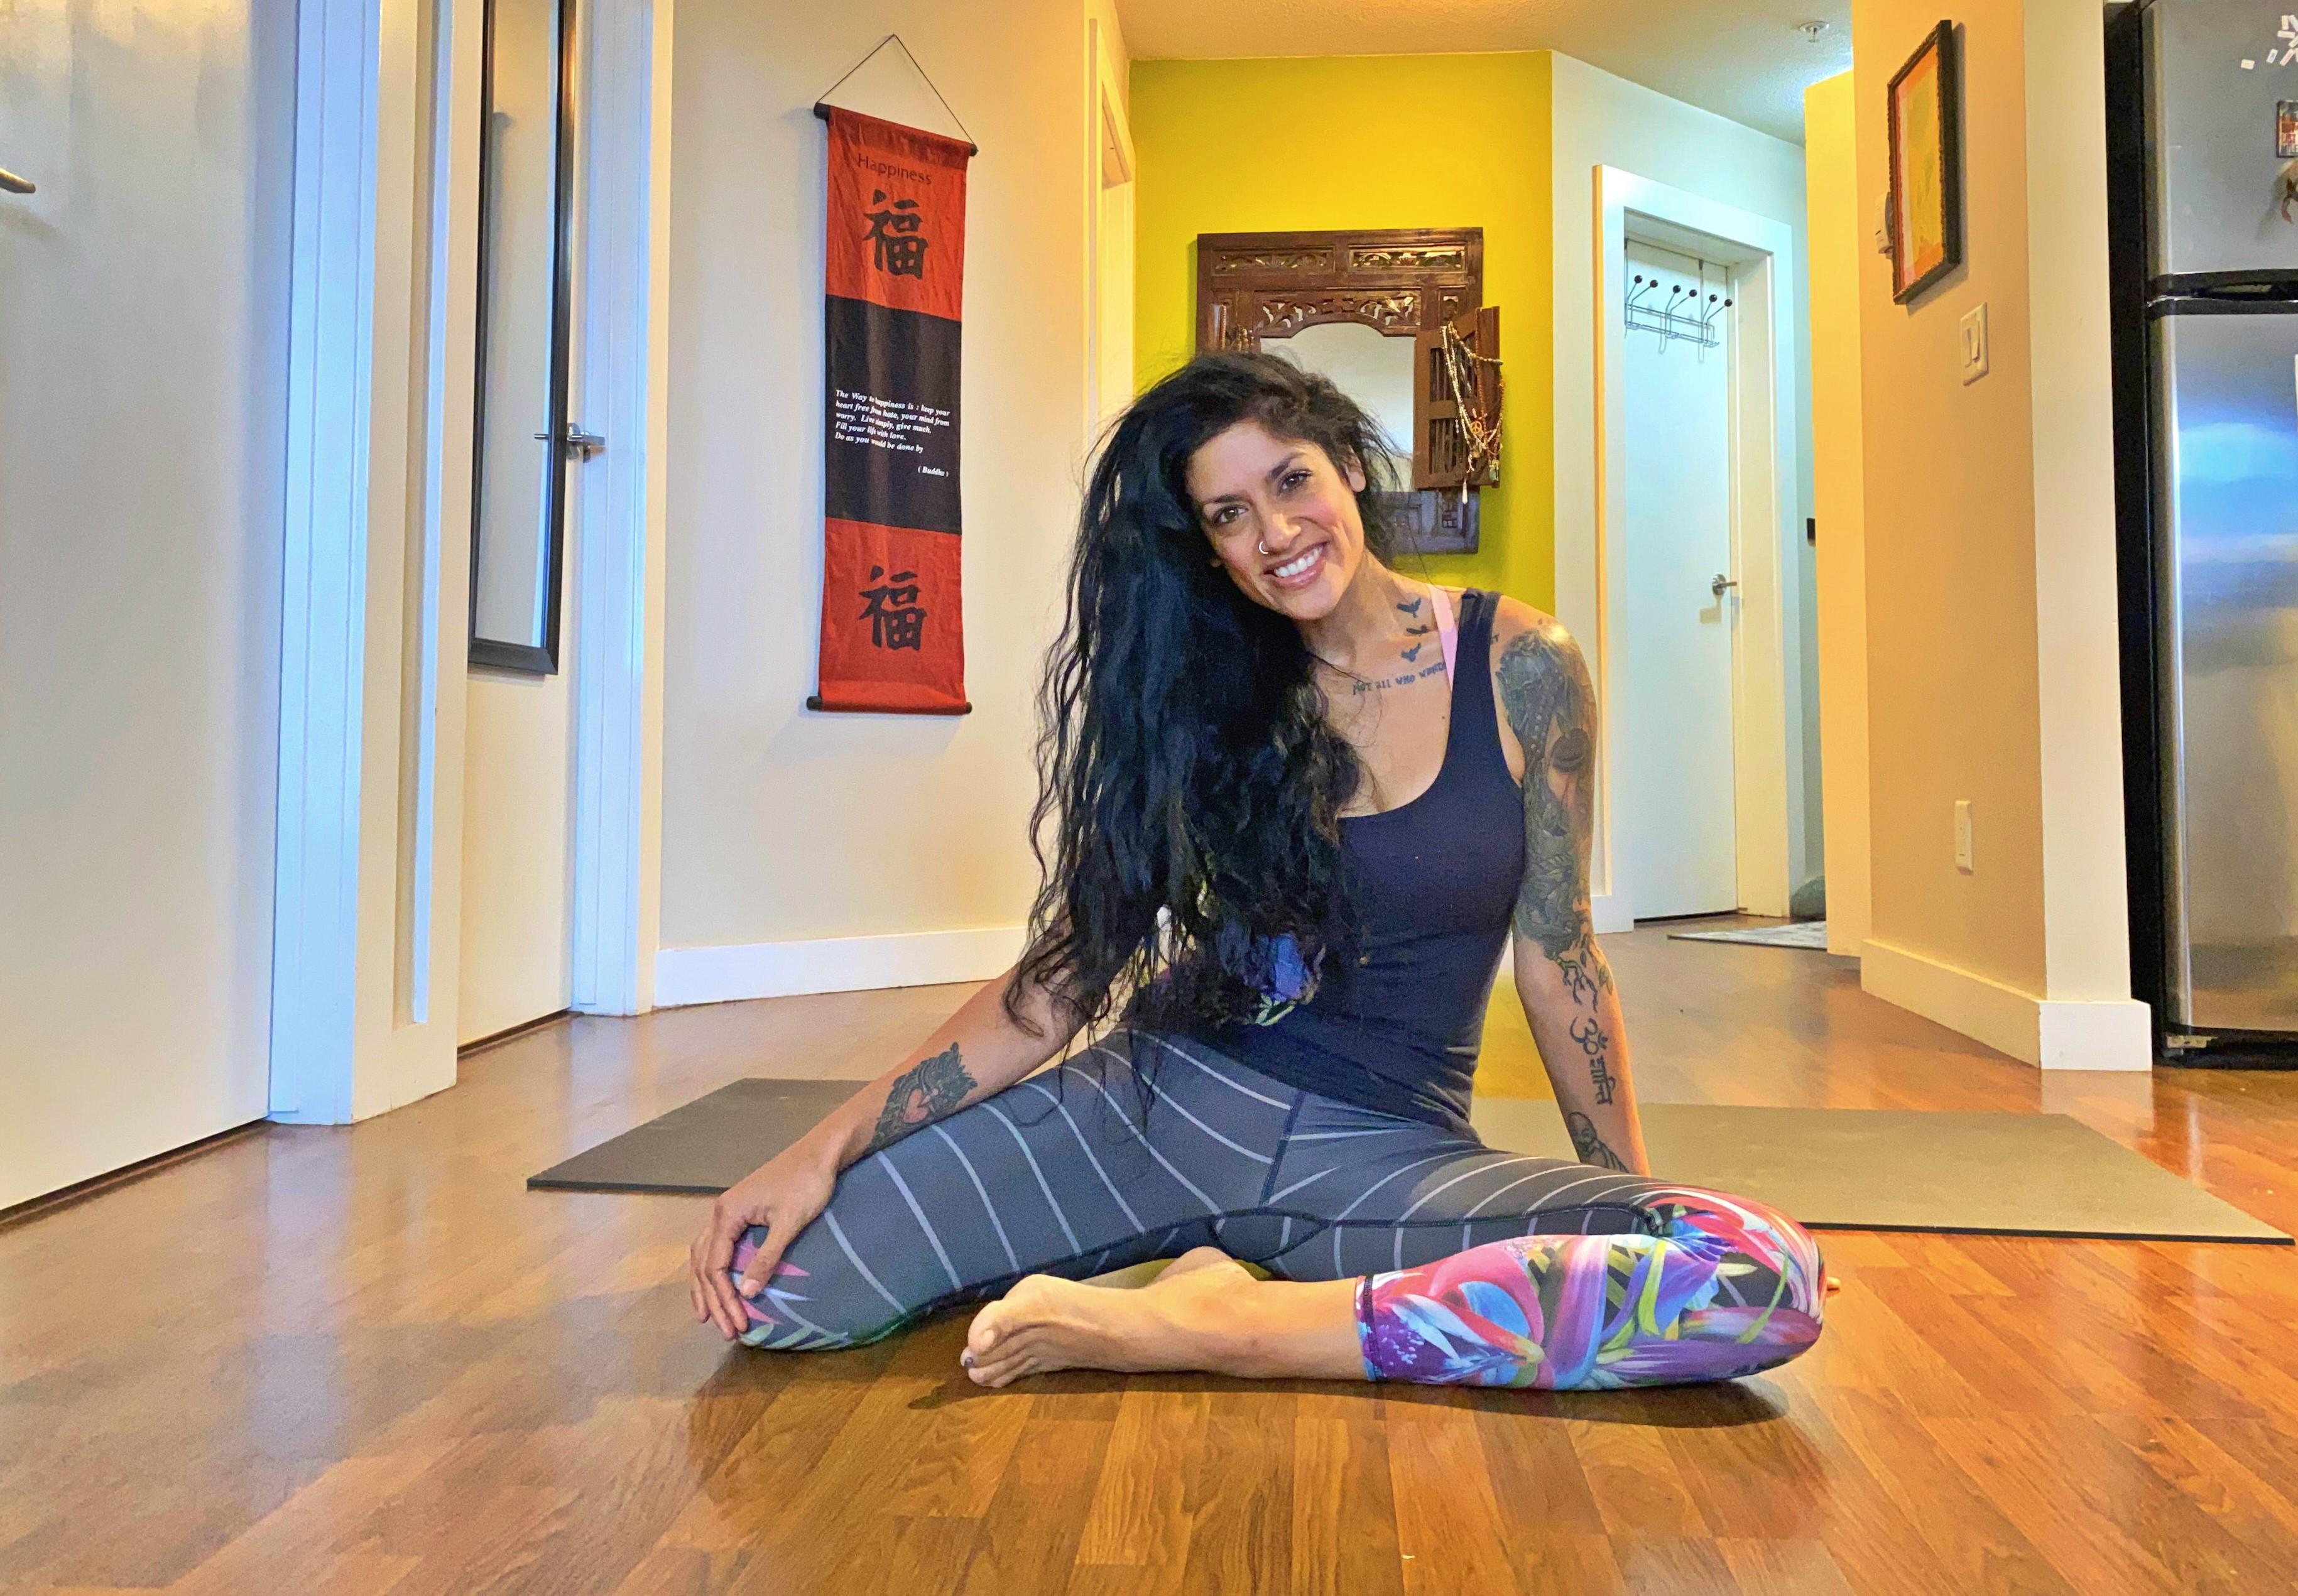 Becca Pati, Yoga, vinyasa, meditation, hatha, beginner, intermediate, advanced, flow, gentle, strength, core, workout,